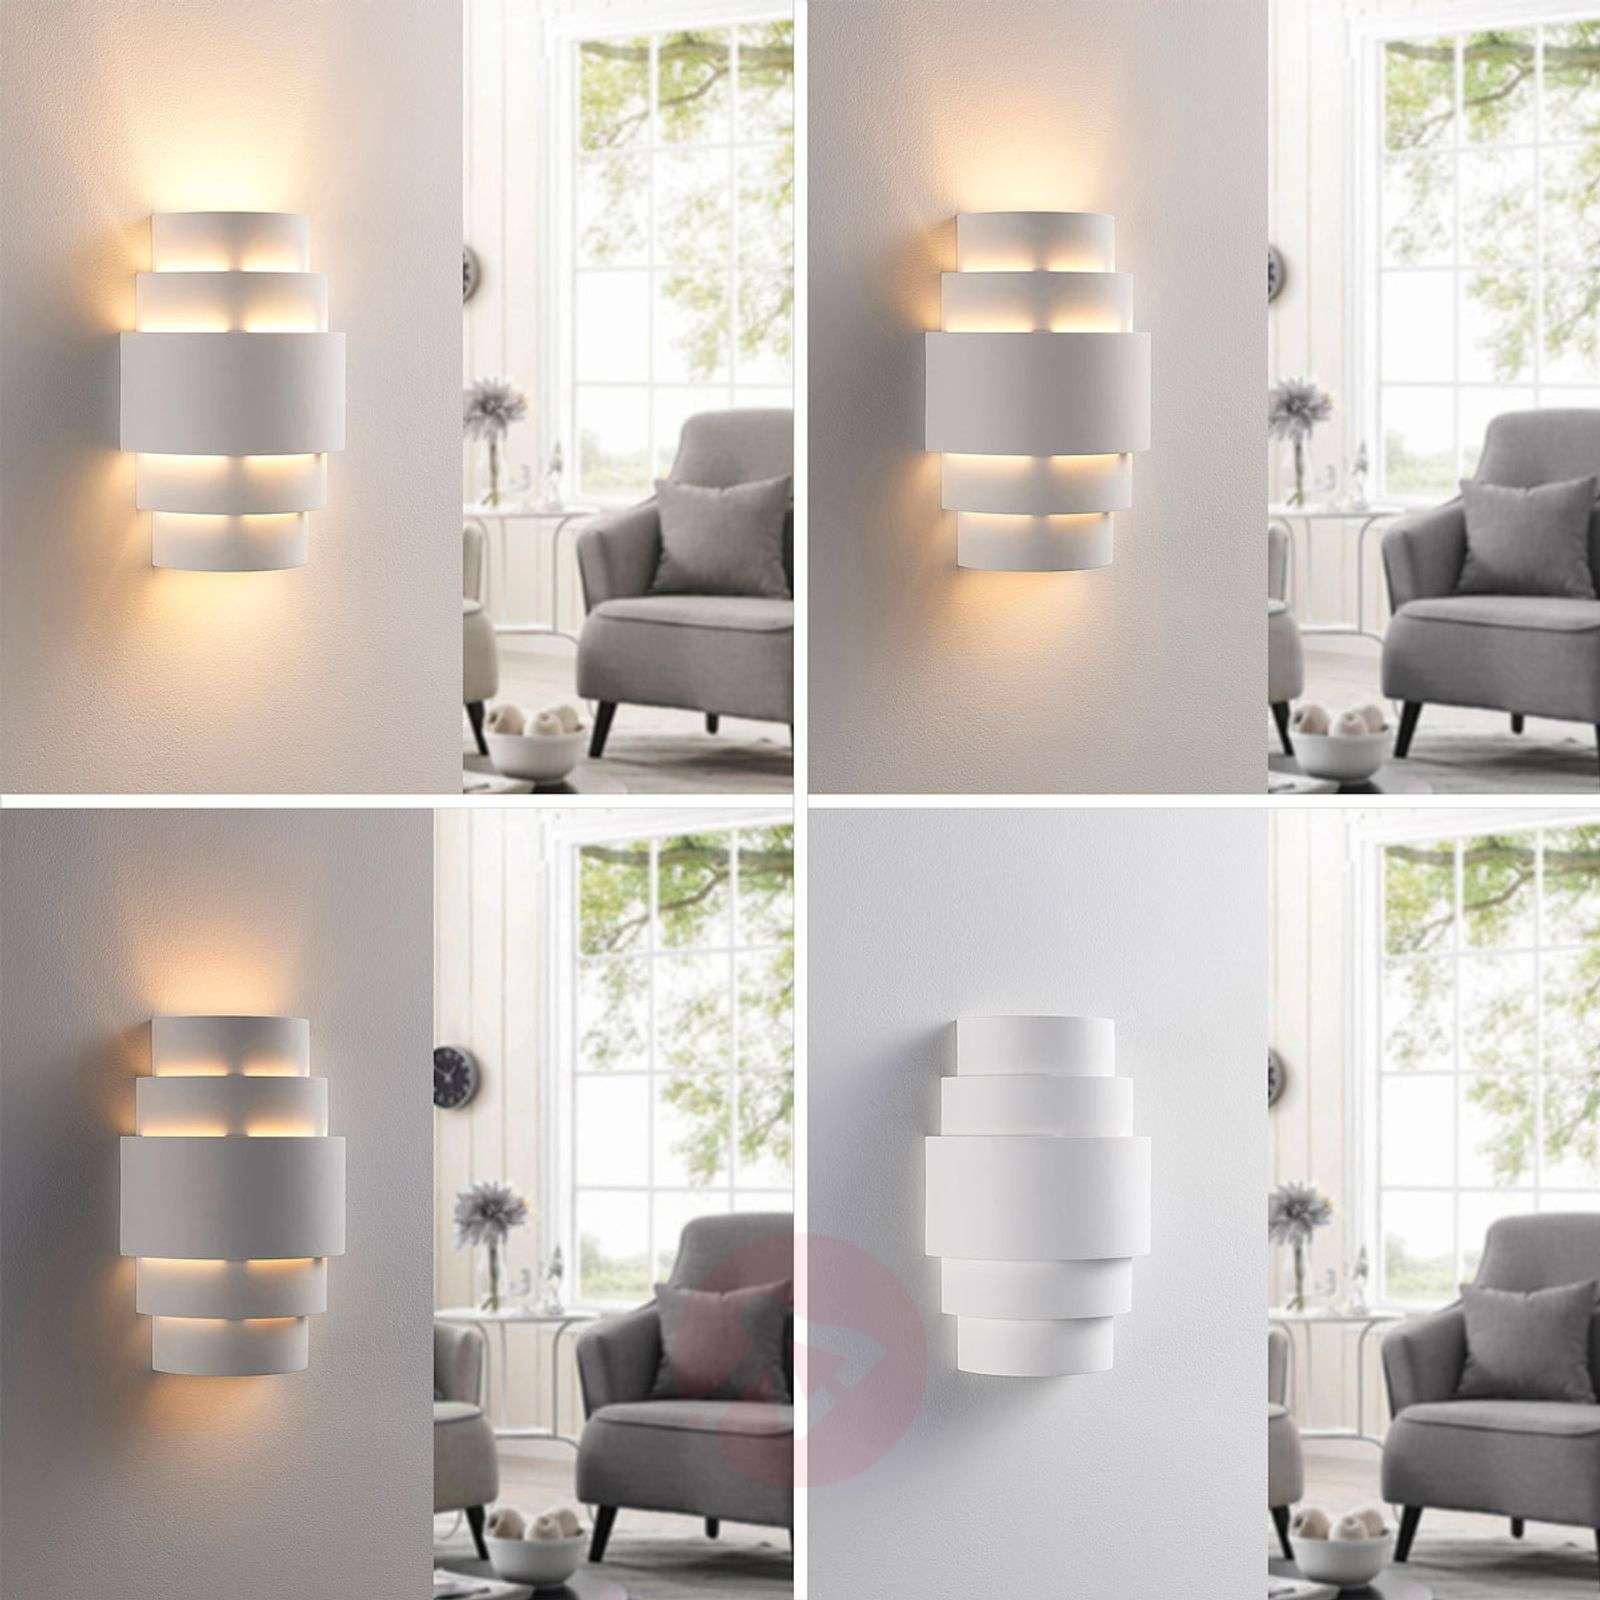 Marit step-like LED wall lamp, Easydim-9621331-01